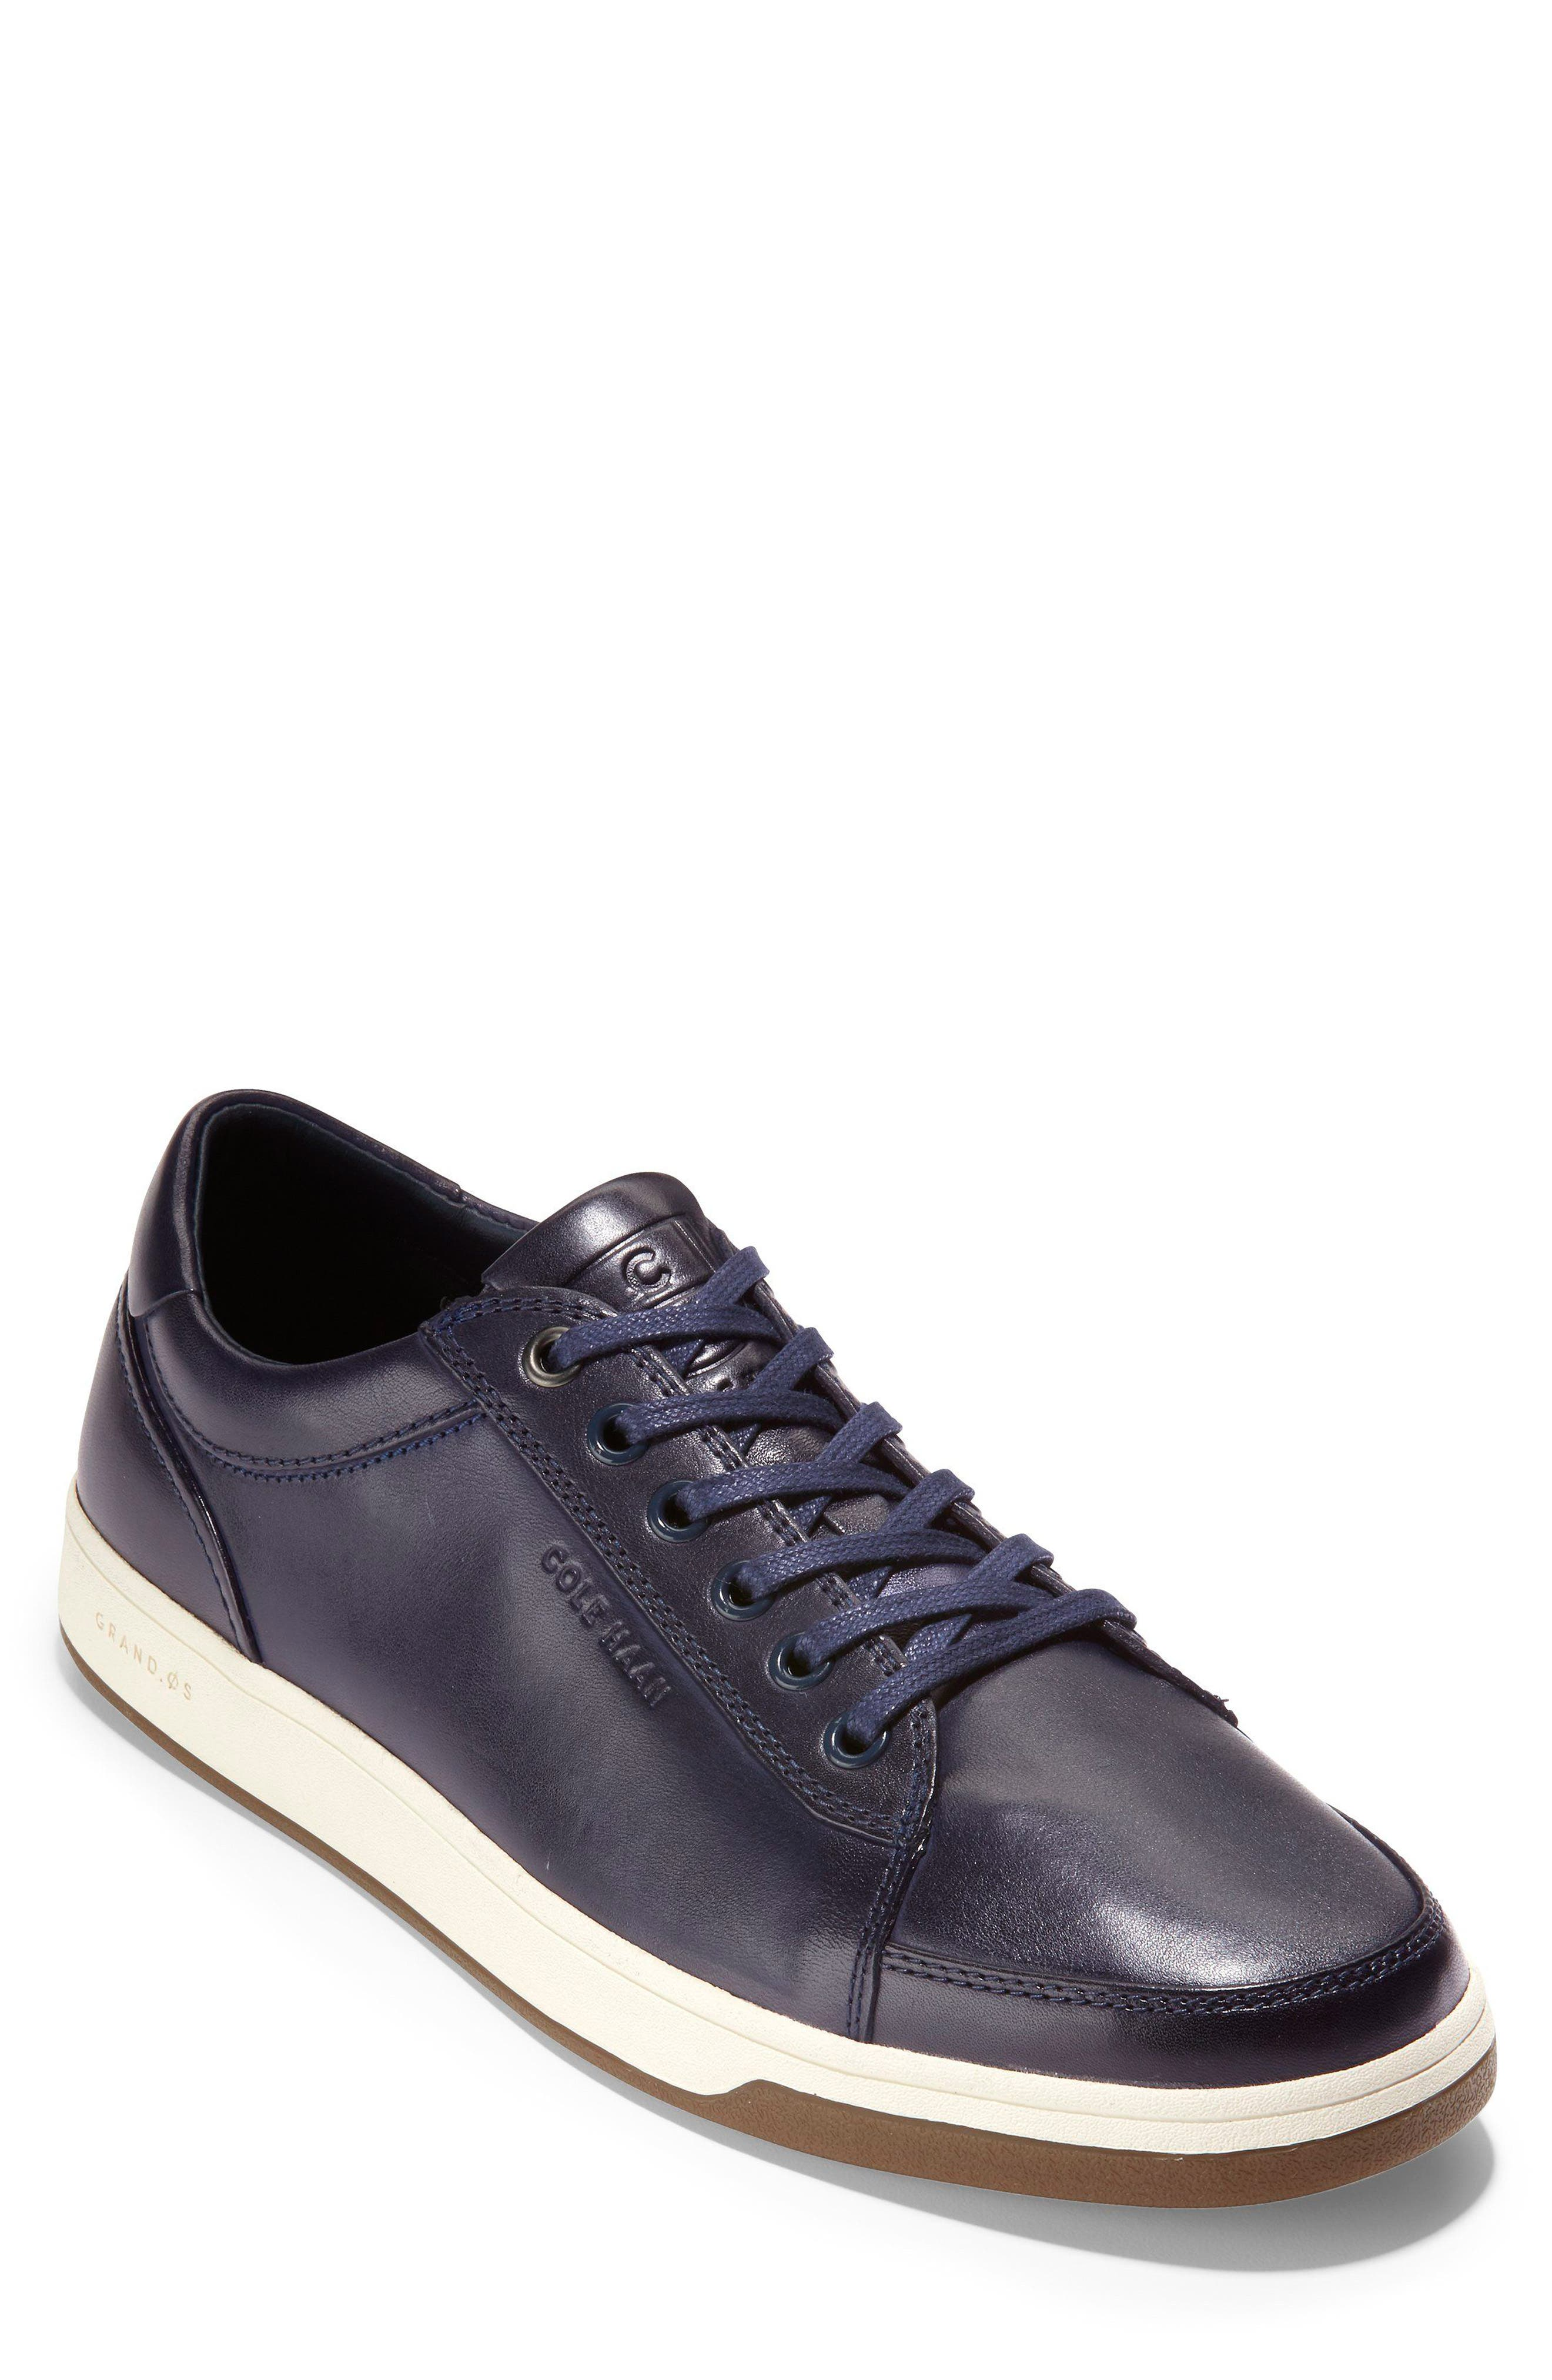 GrandPro Spectator Sneaker,                         Main,                         color, Blazer Blue Handstain Leather